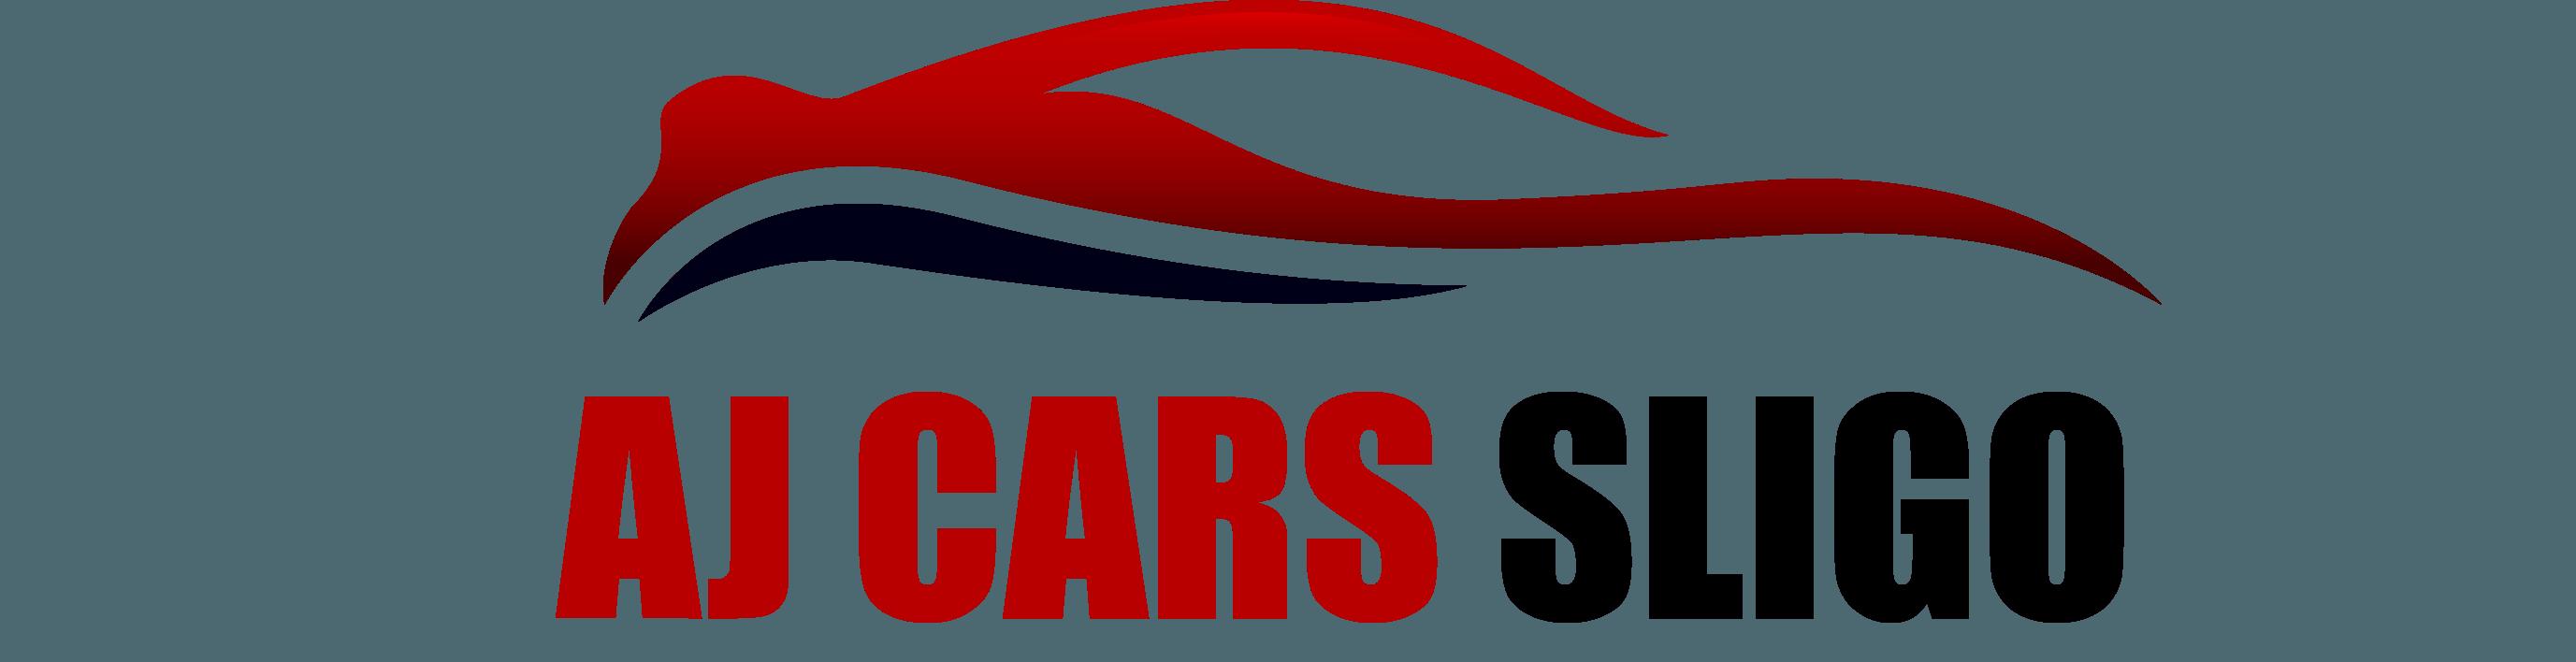 AJ Cars Sales